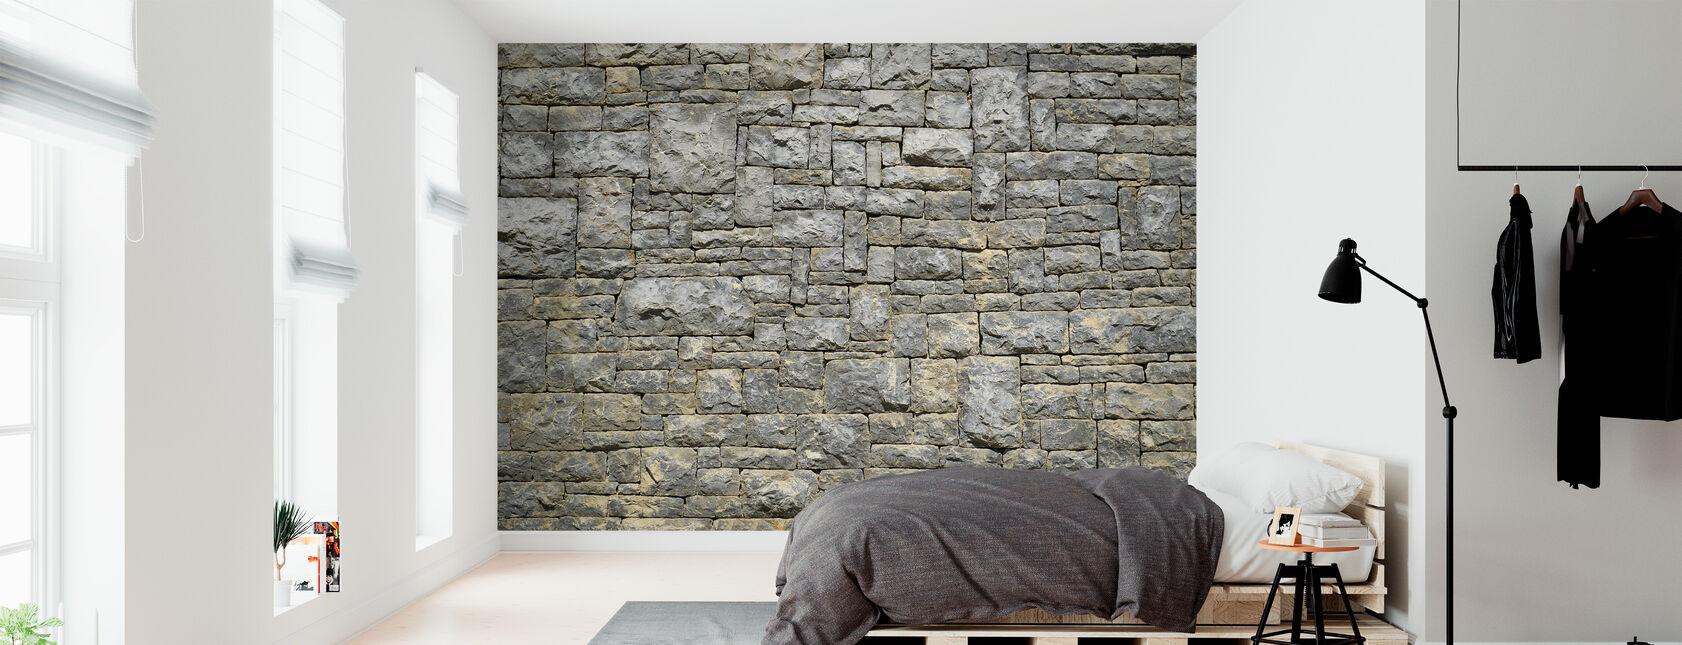 Granite Brick Wall - Wallpaper - Bedroom